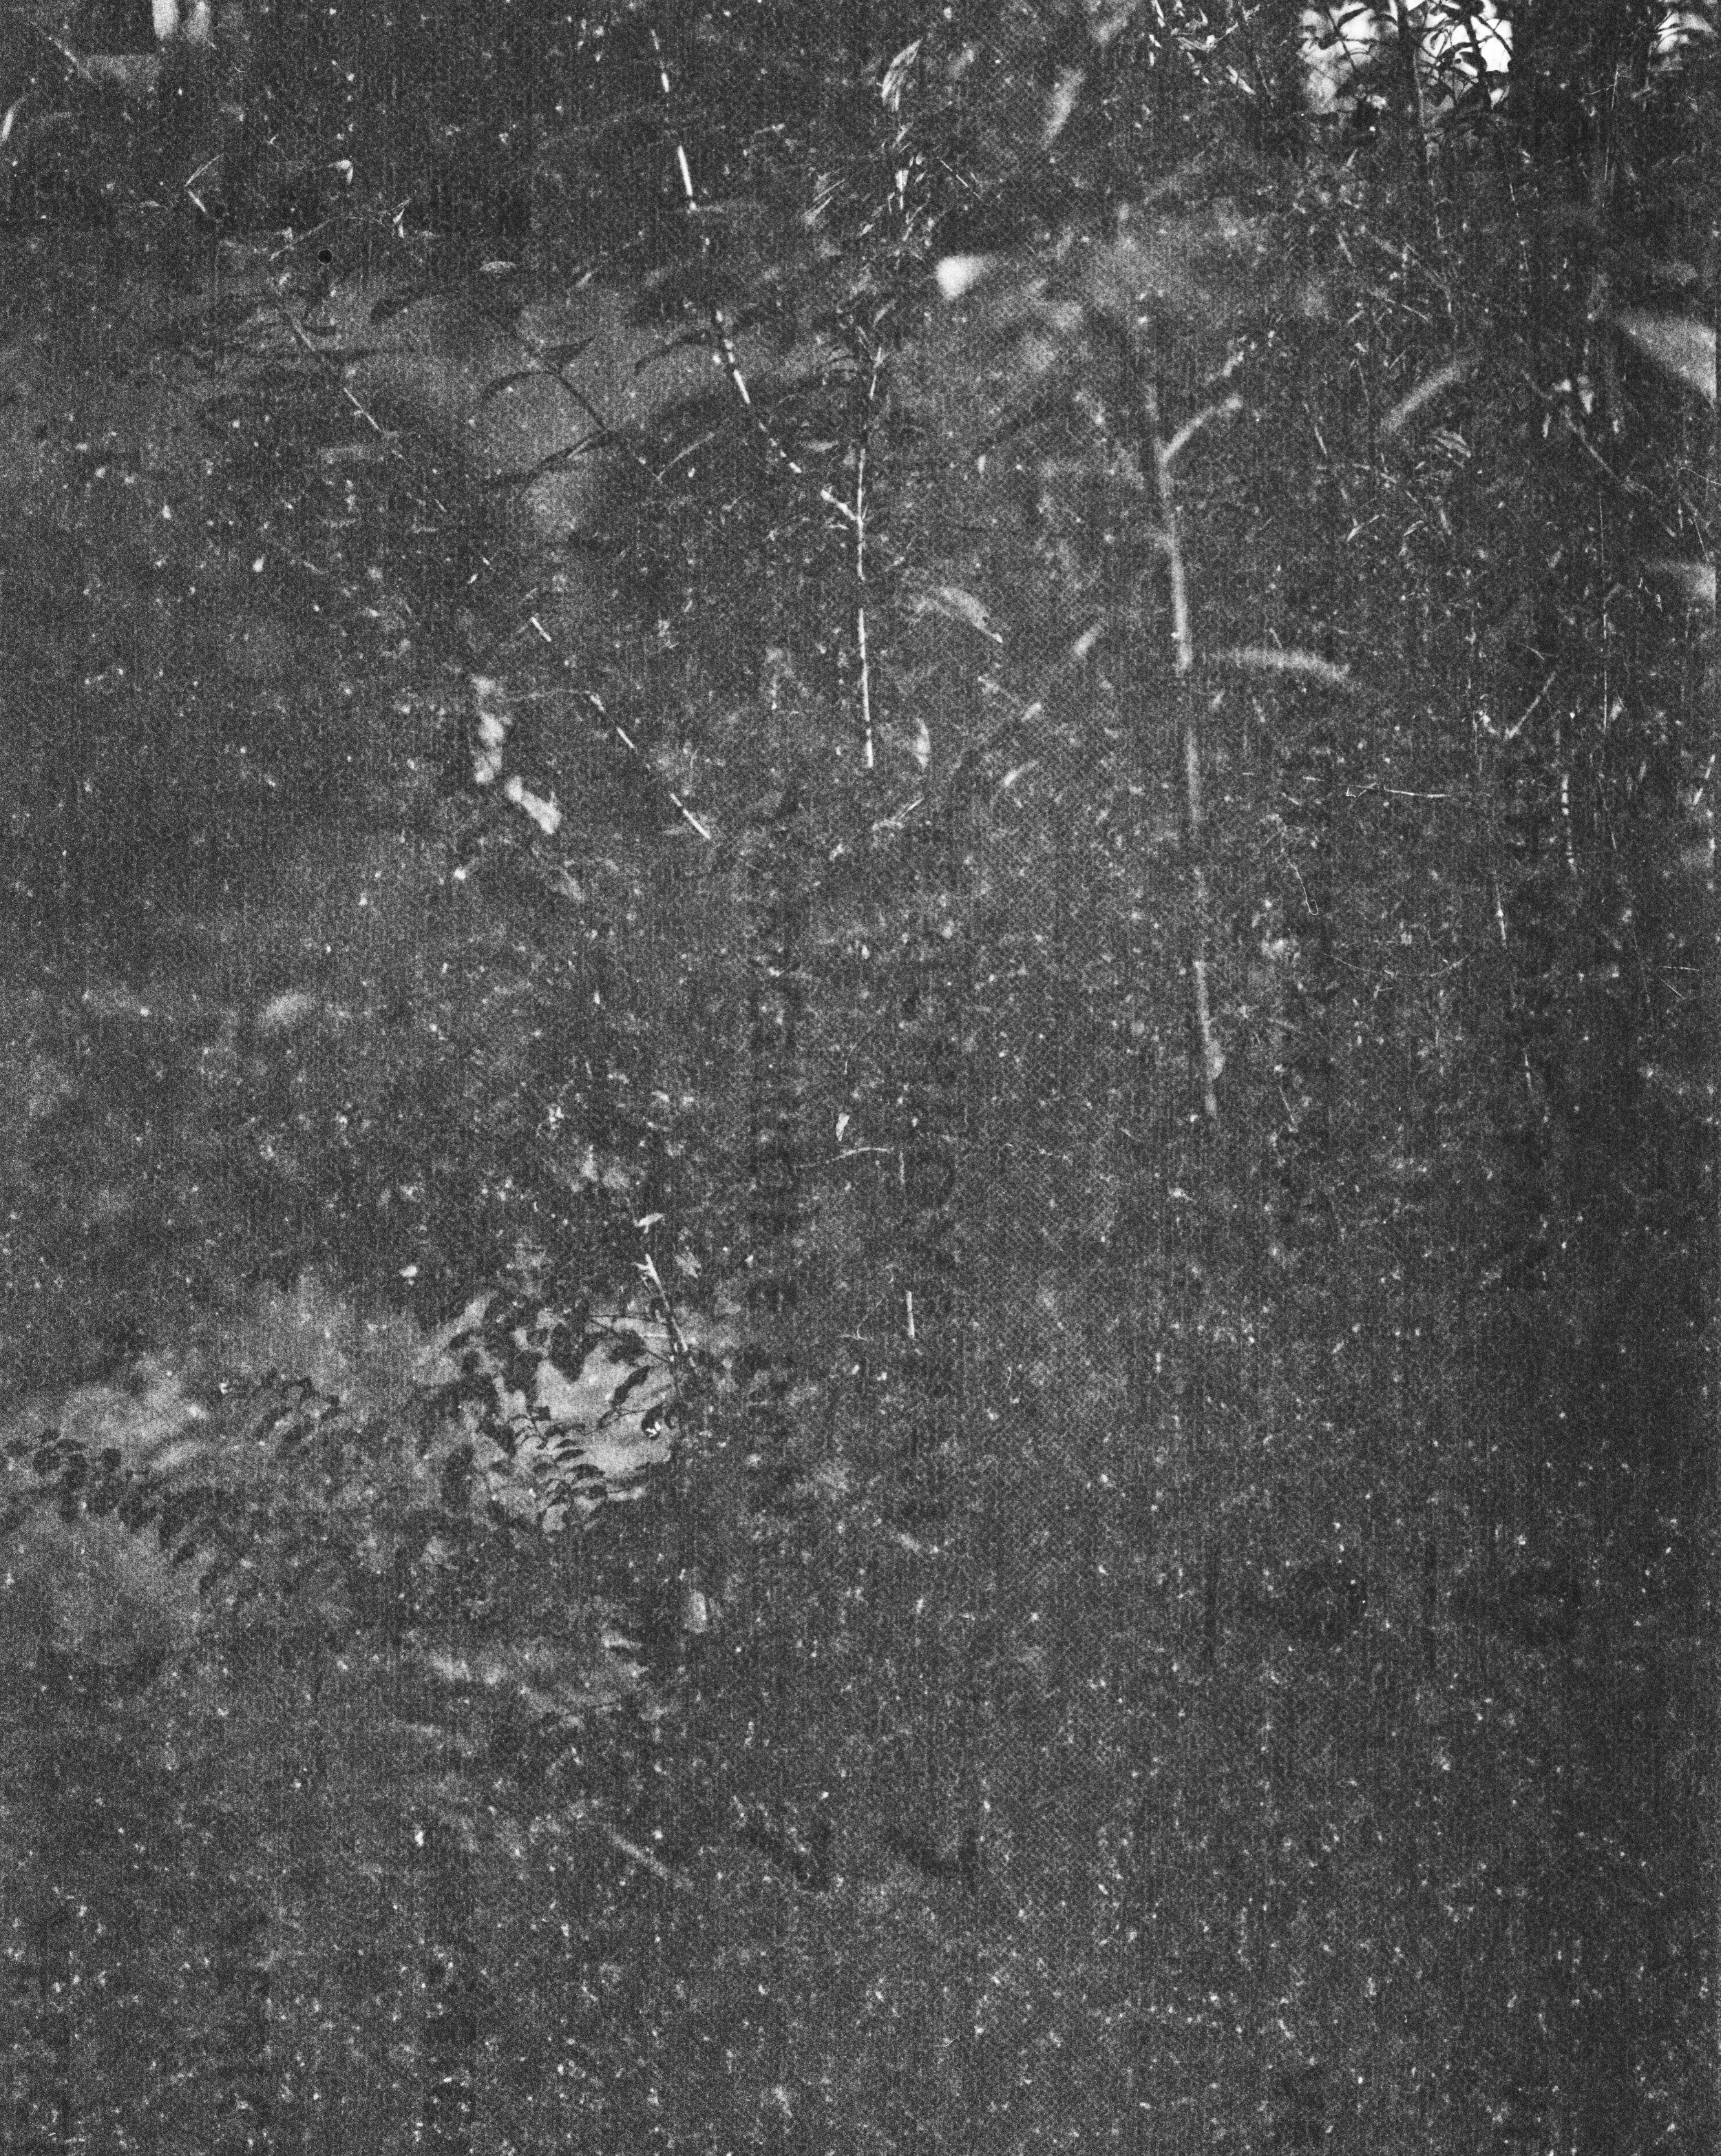 lydiasee-creekoffspringdale2014-color120mm-batch144.JPG